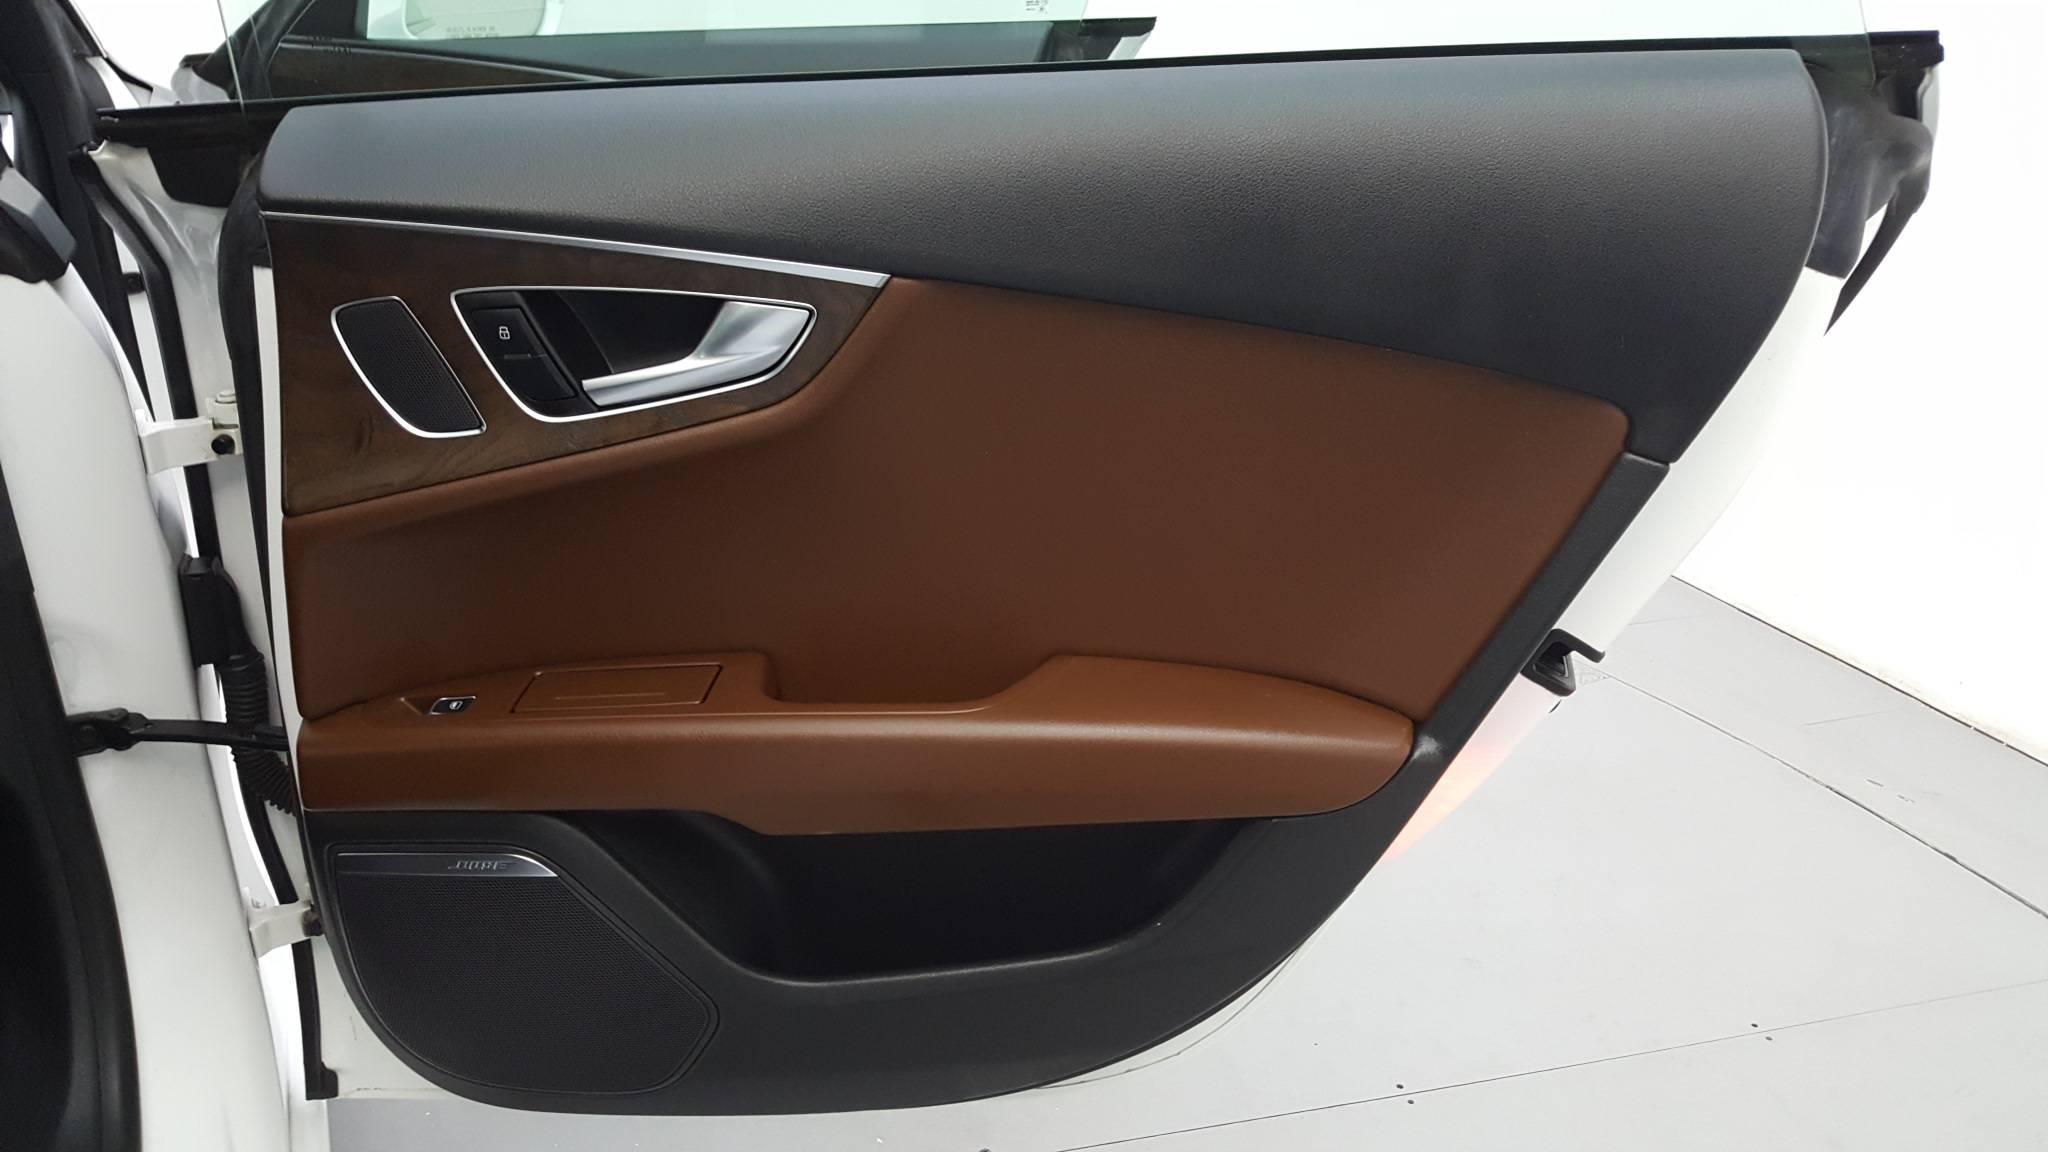 Pre-Owned 2013 Audi A7 3.0 Prestige